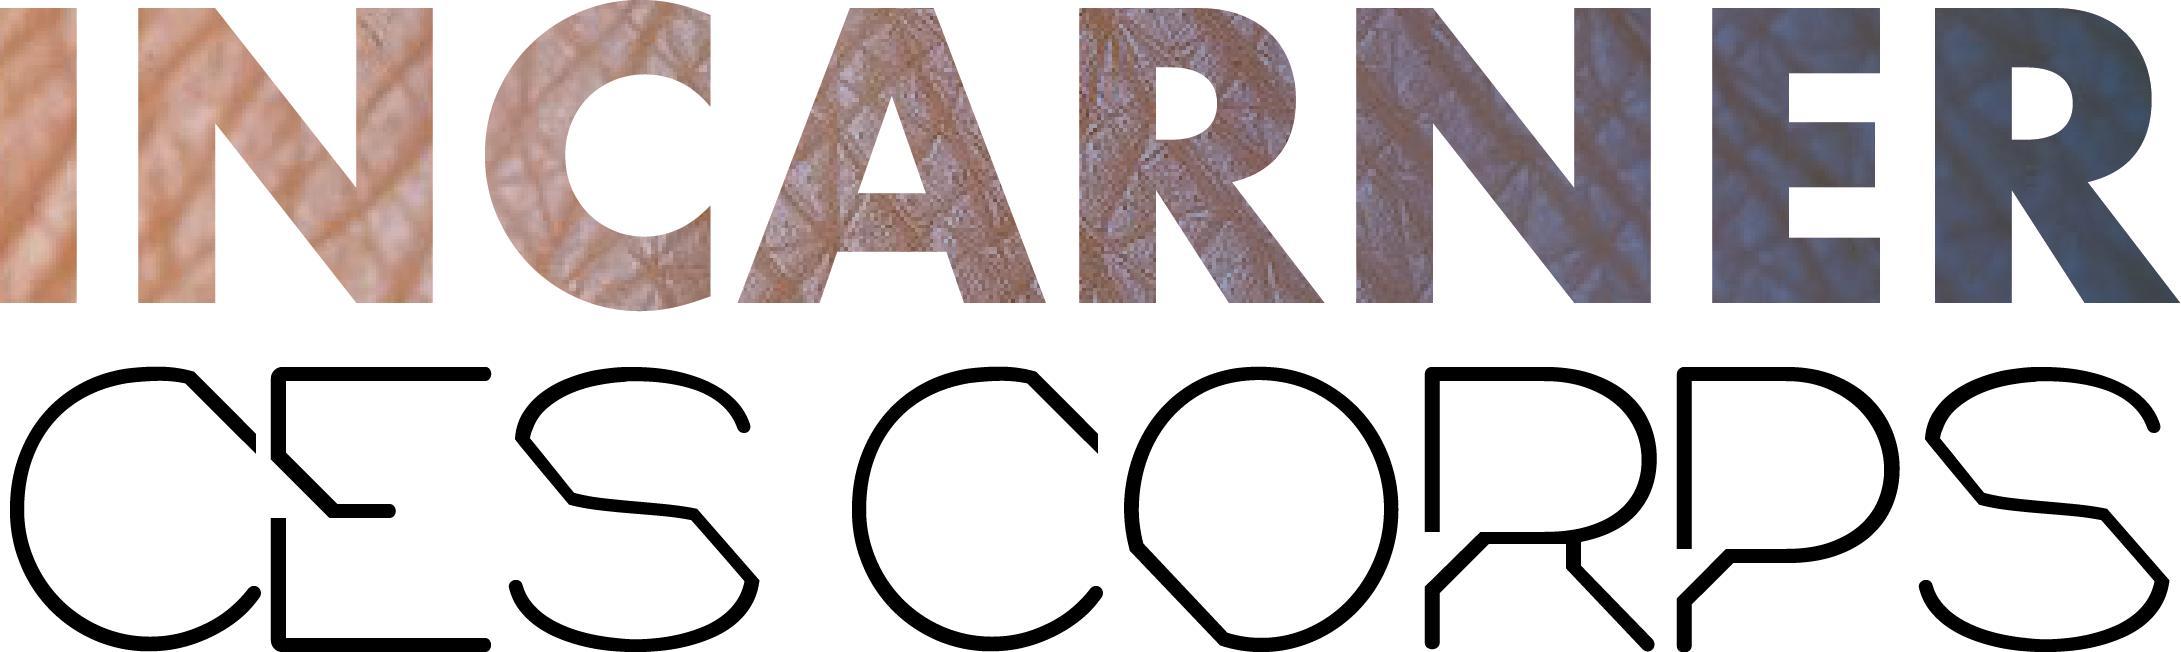 Incarner_ces_corps